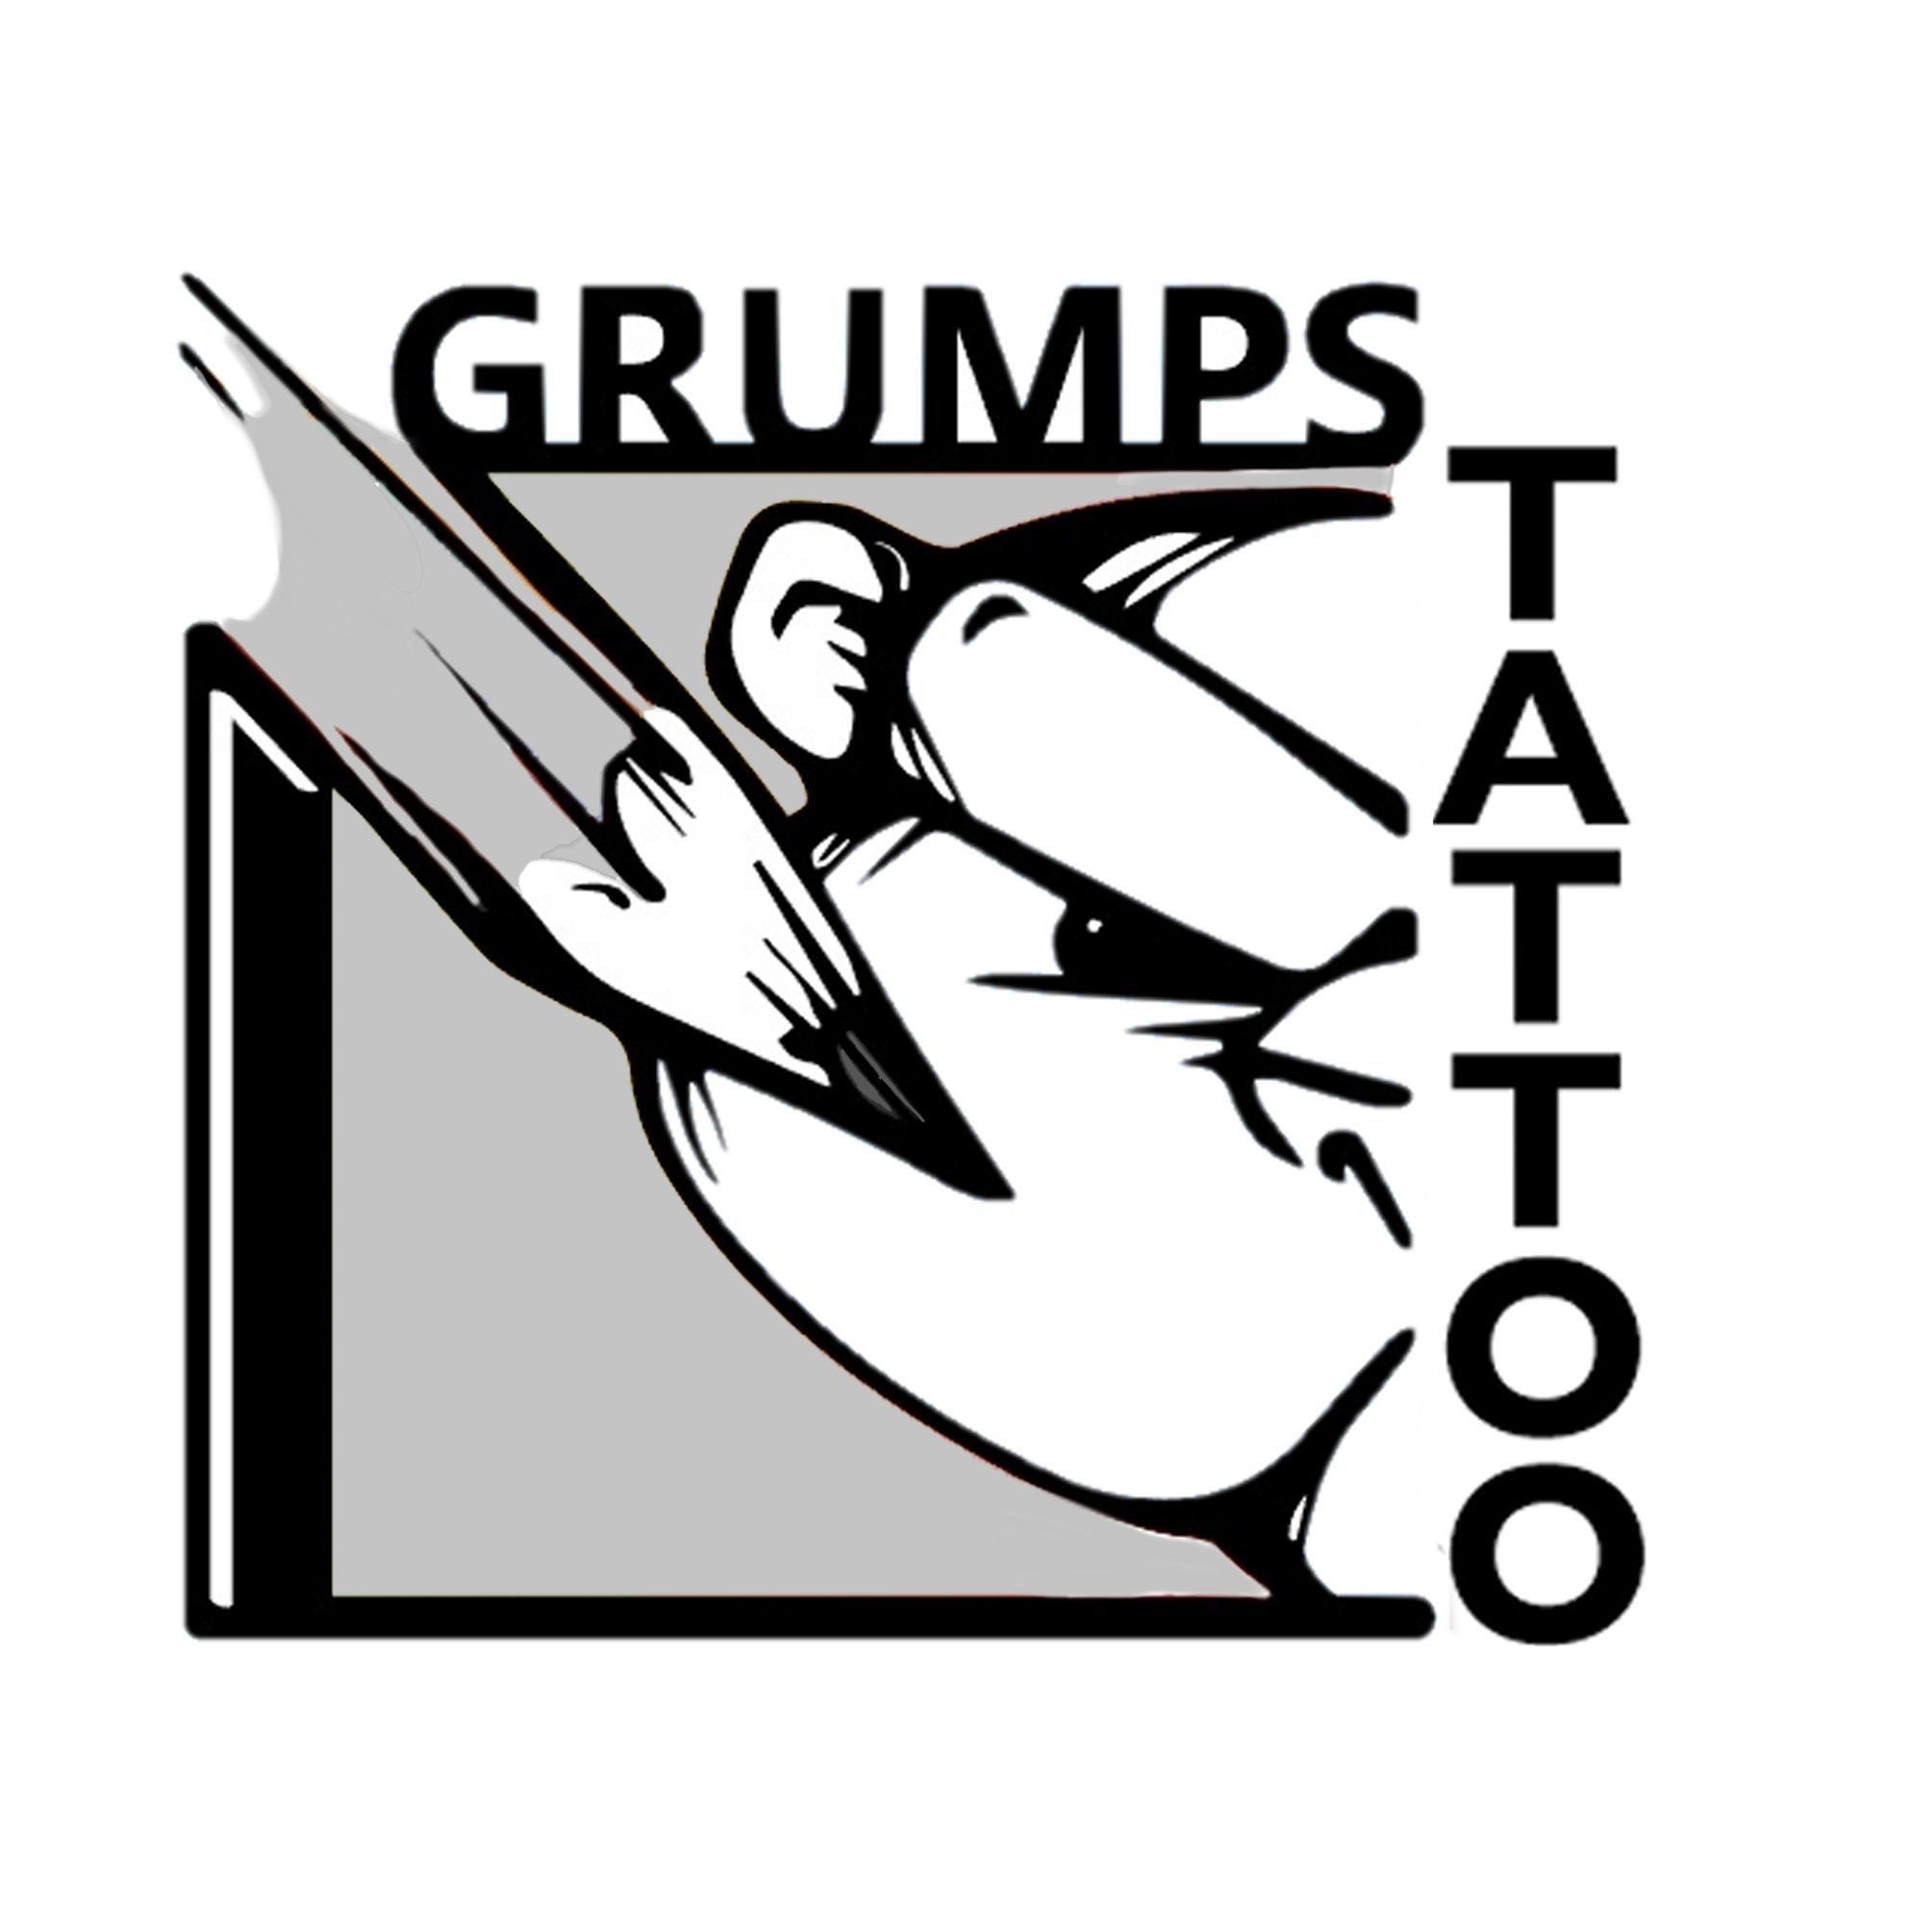 Grumpstattoo - Aberdeen, Aberdeenshire AB24 3NL - 07495 702314 | ShowMeLocal.com